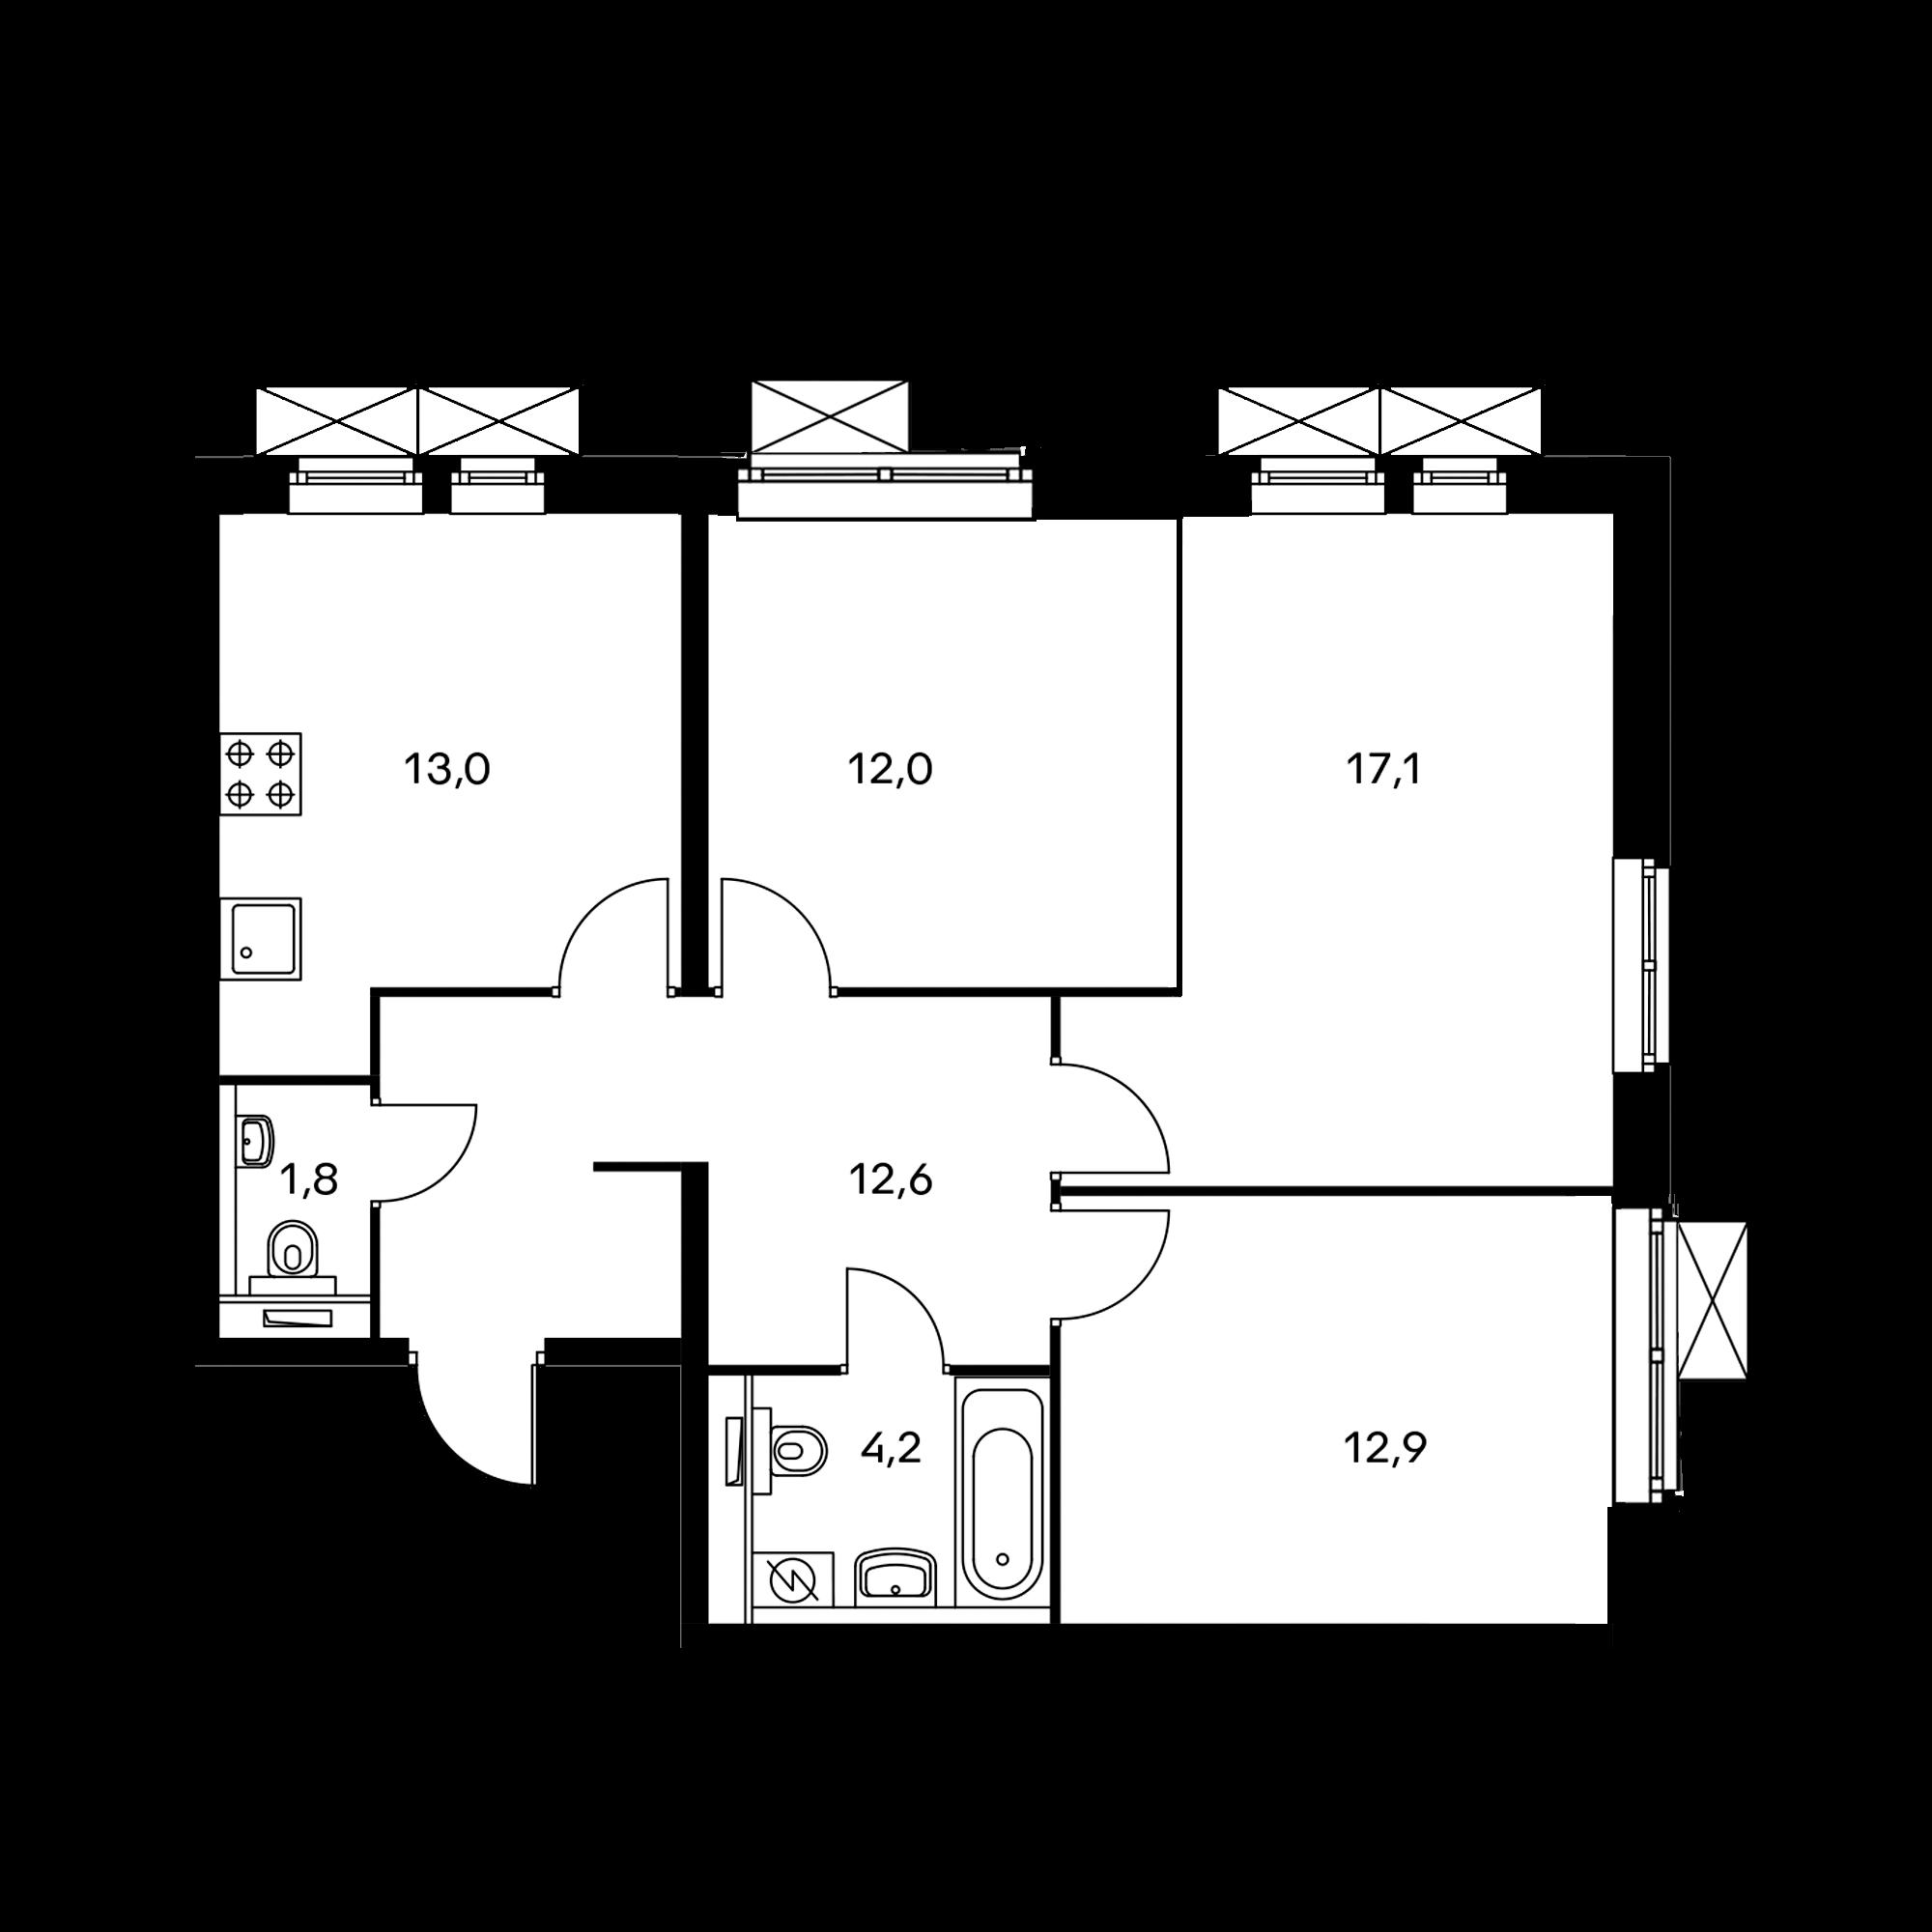 3KM24_10.5-1_2